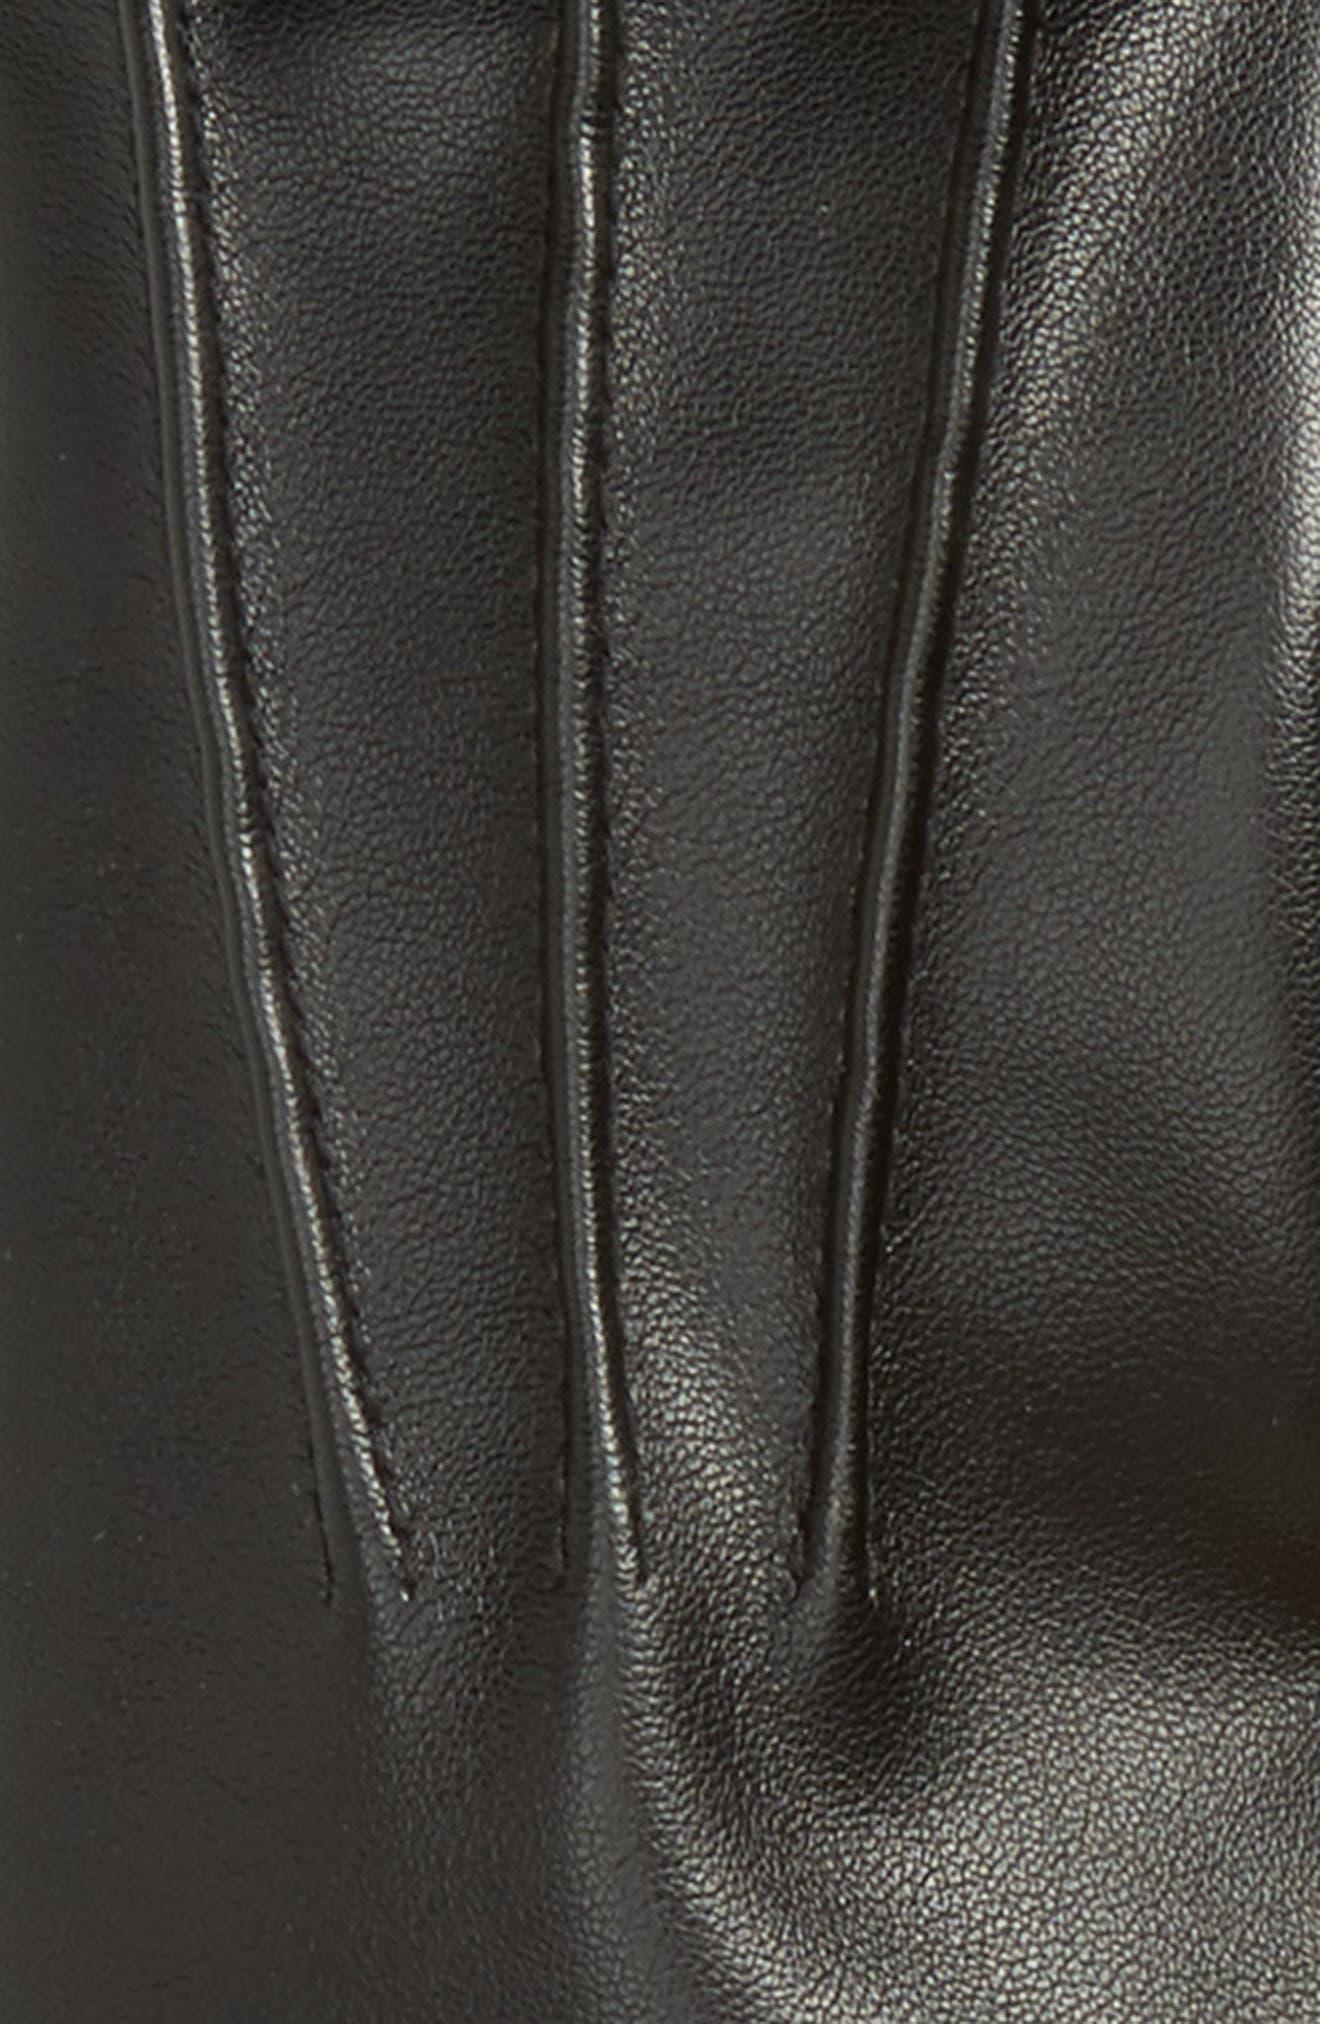 Alternate Image 2  - Stella McCartney Faux Leather Gloves